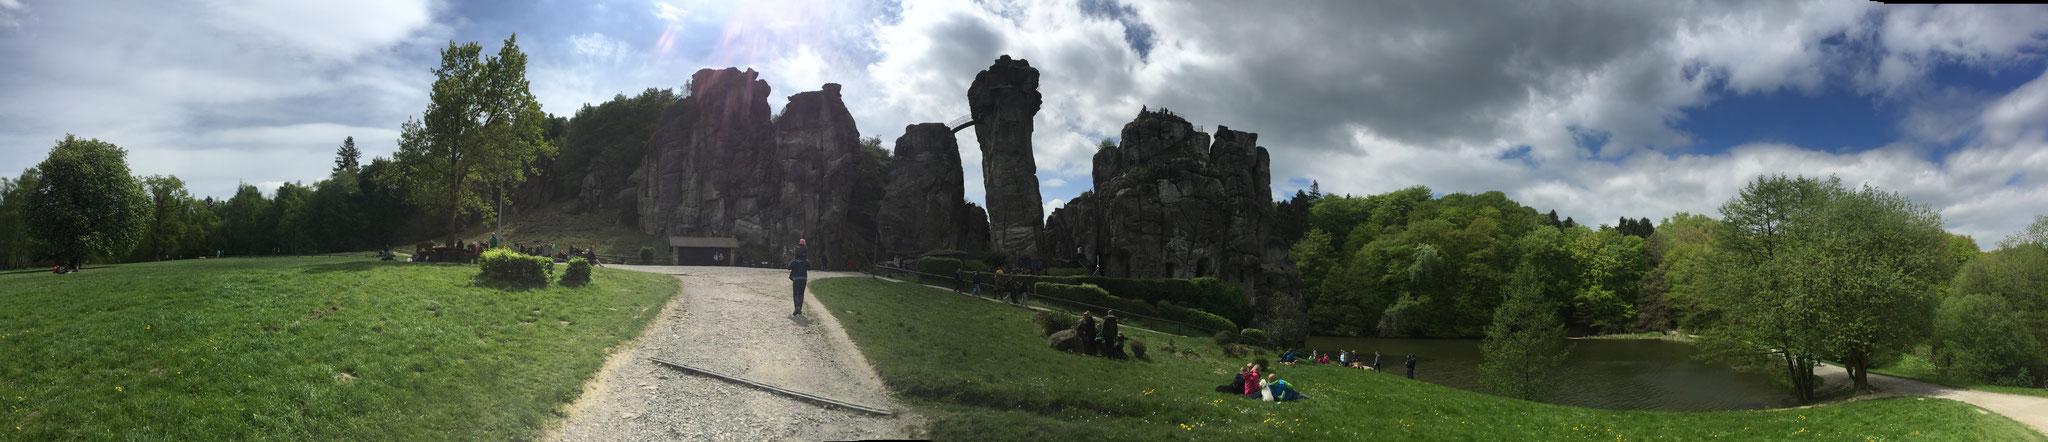 Externsteine, sandstone rock formation north of Germany (May 2018)